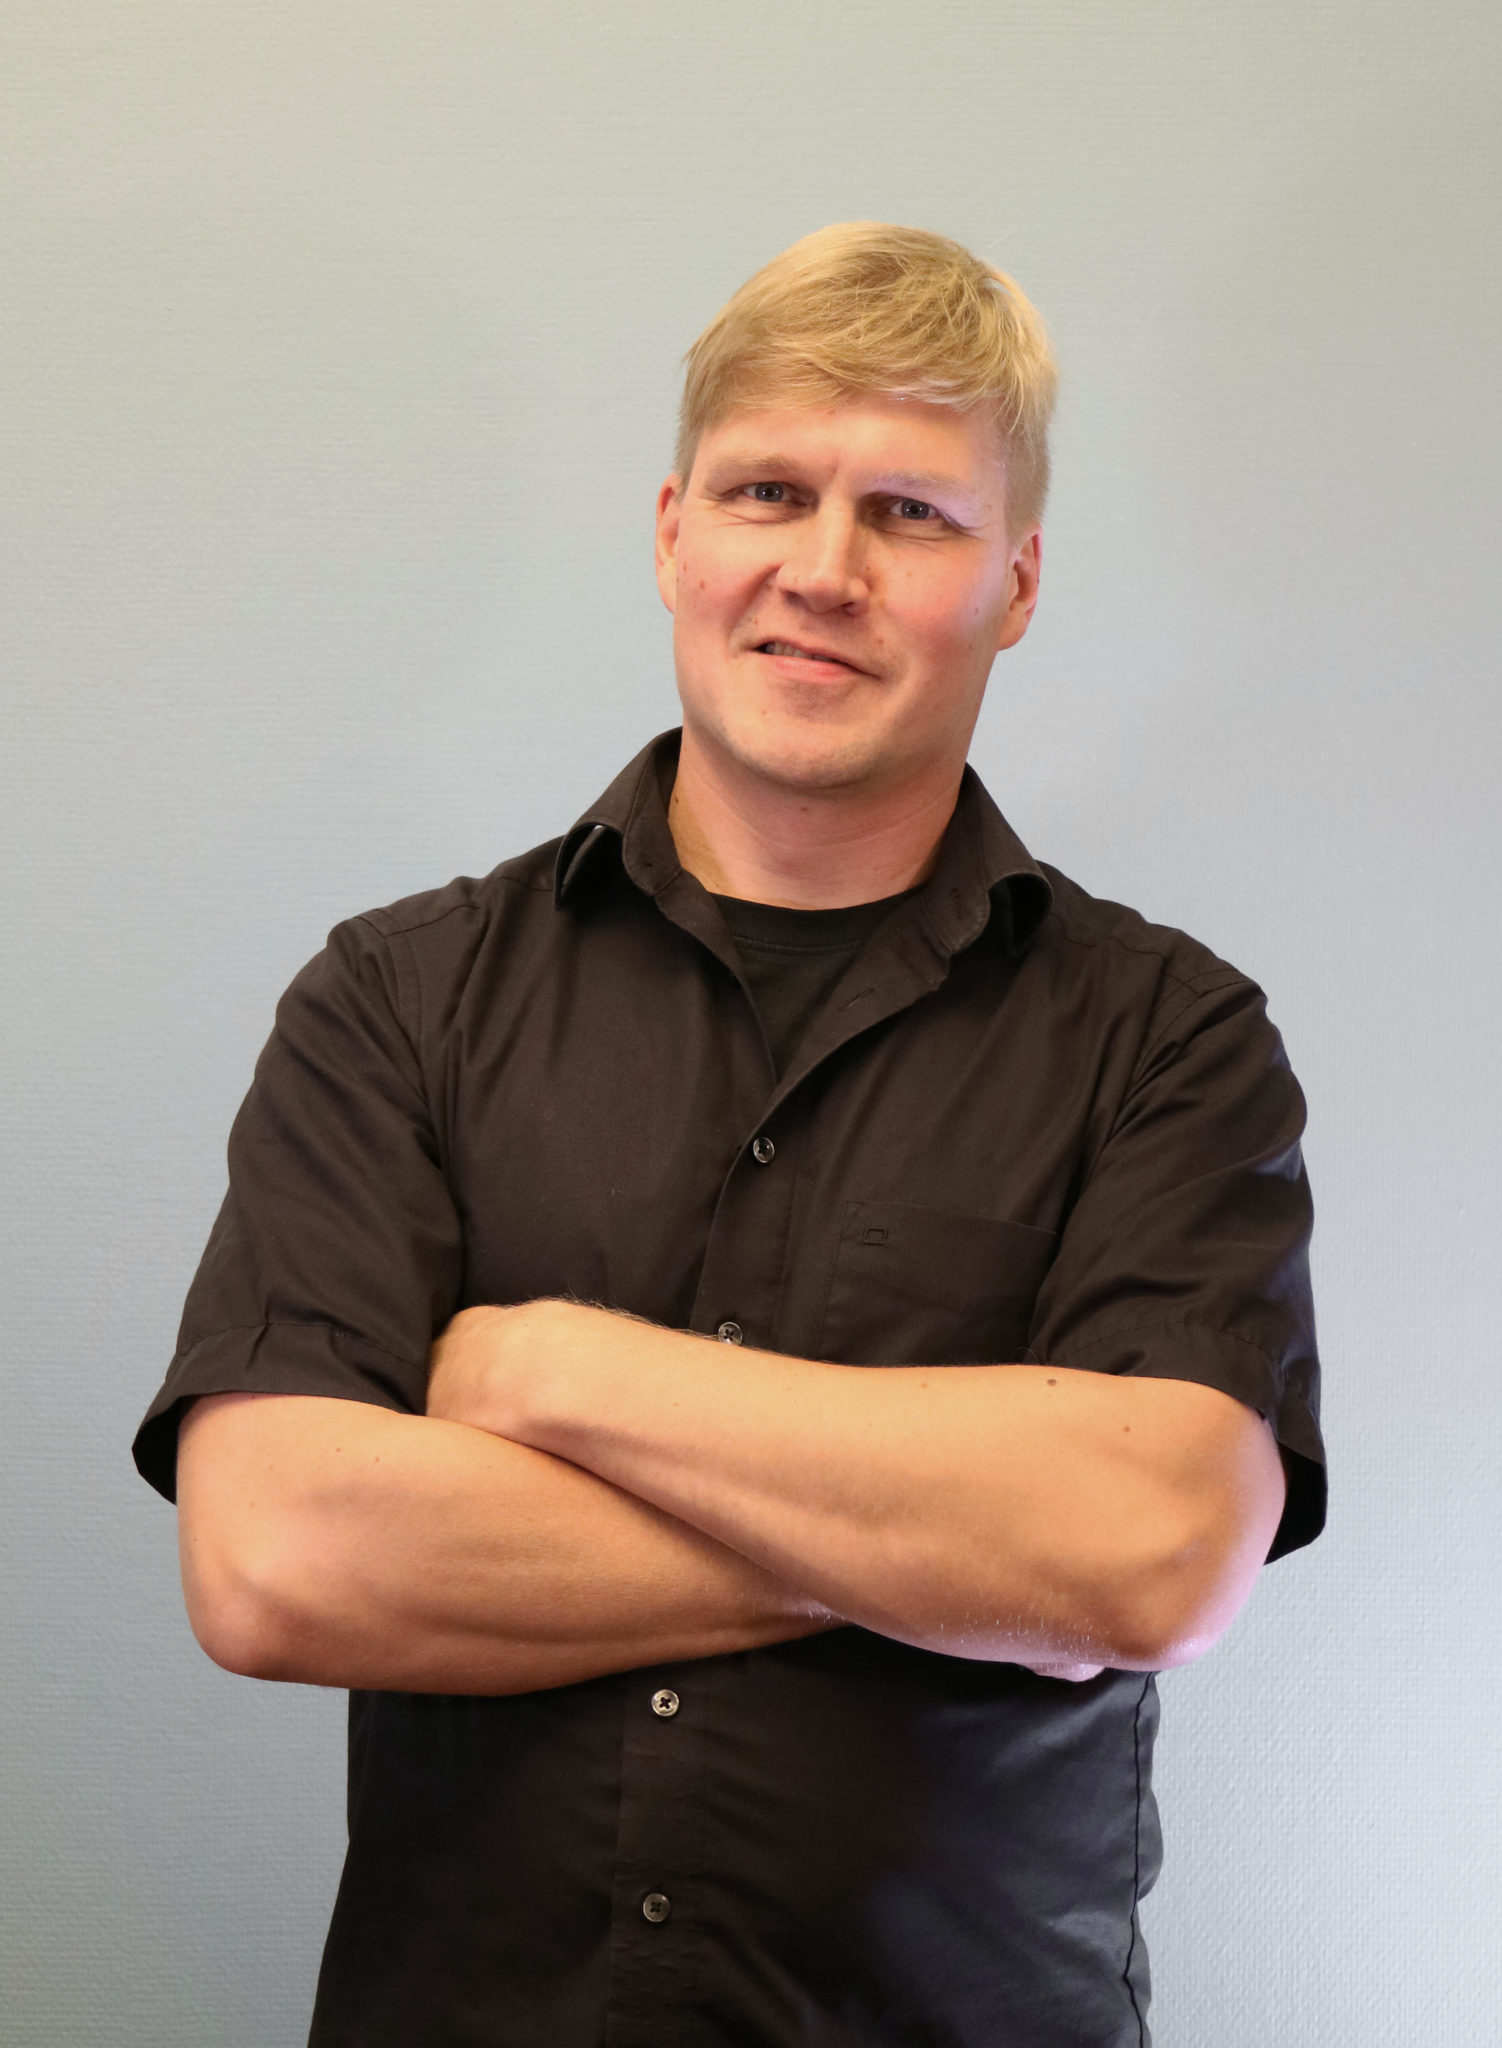 Lasse Mikkonen